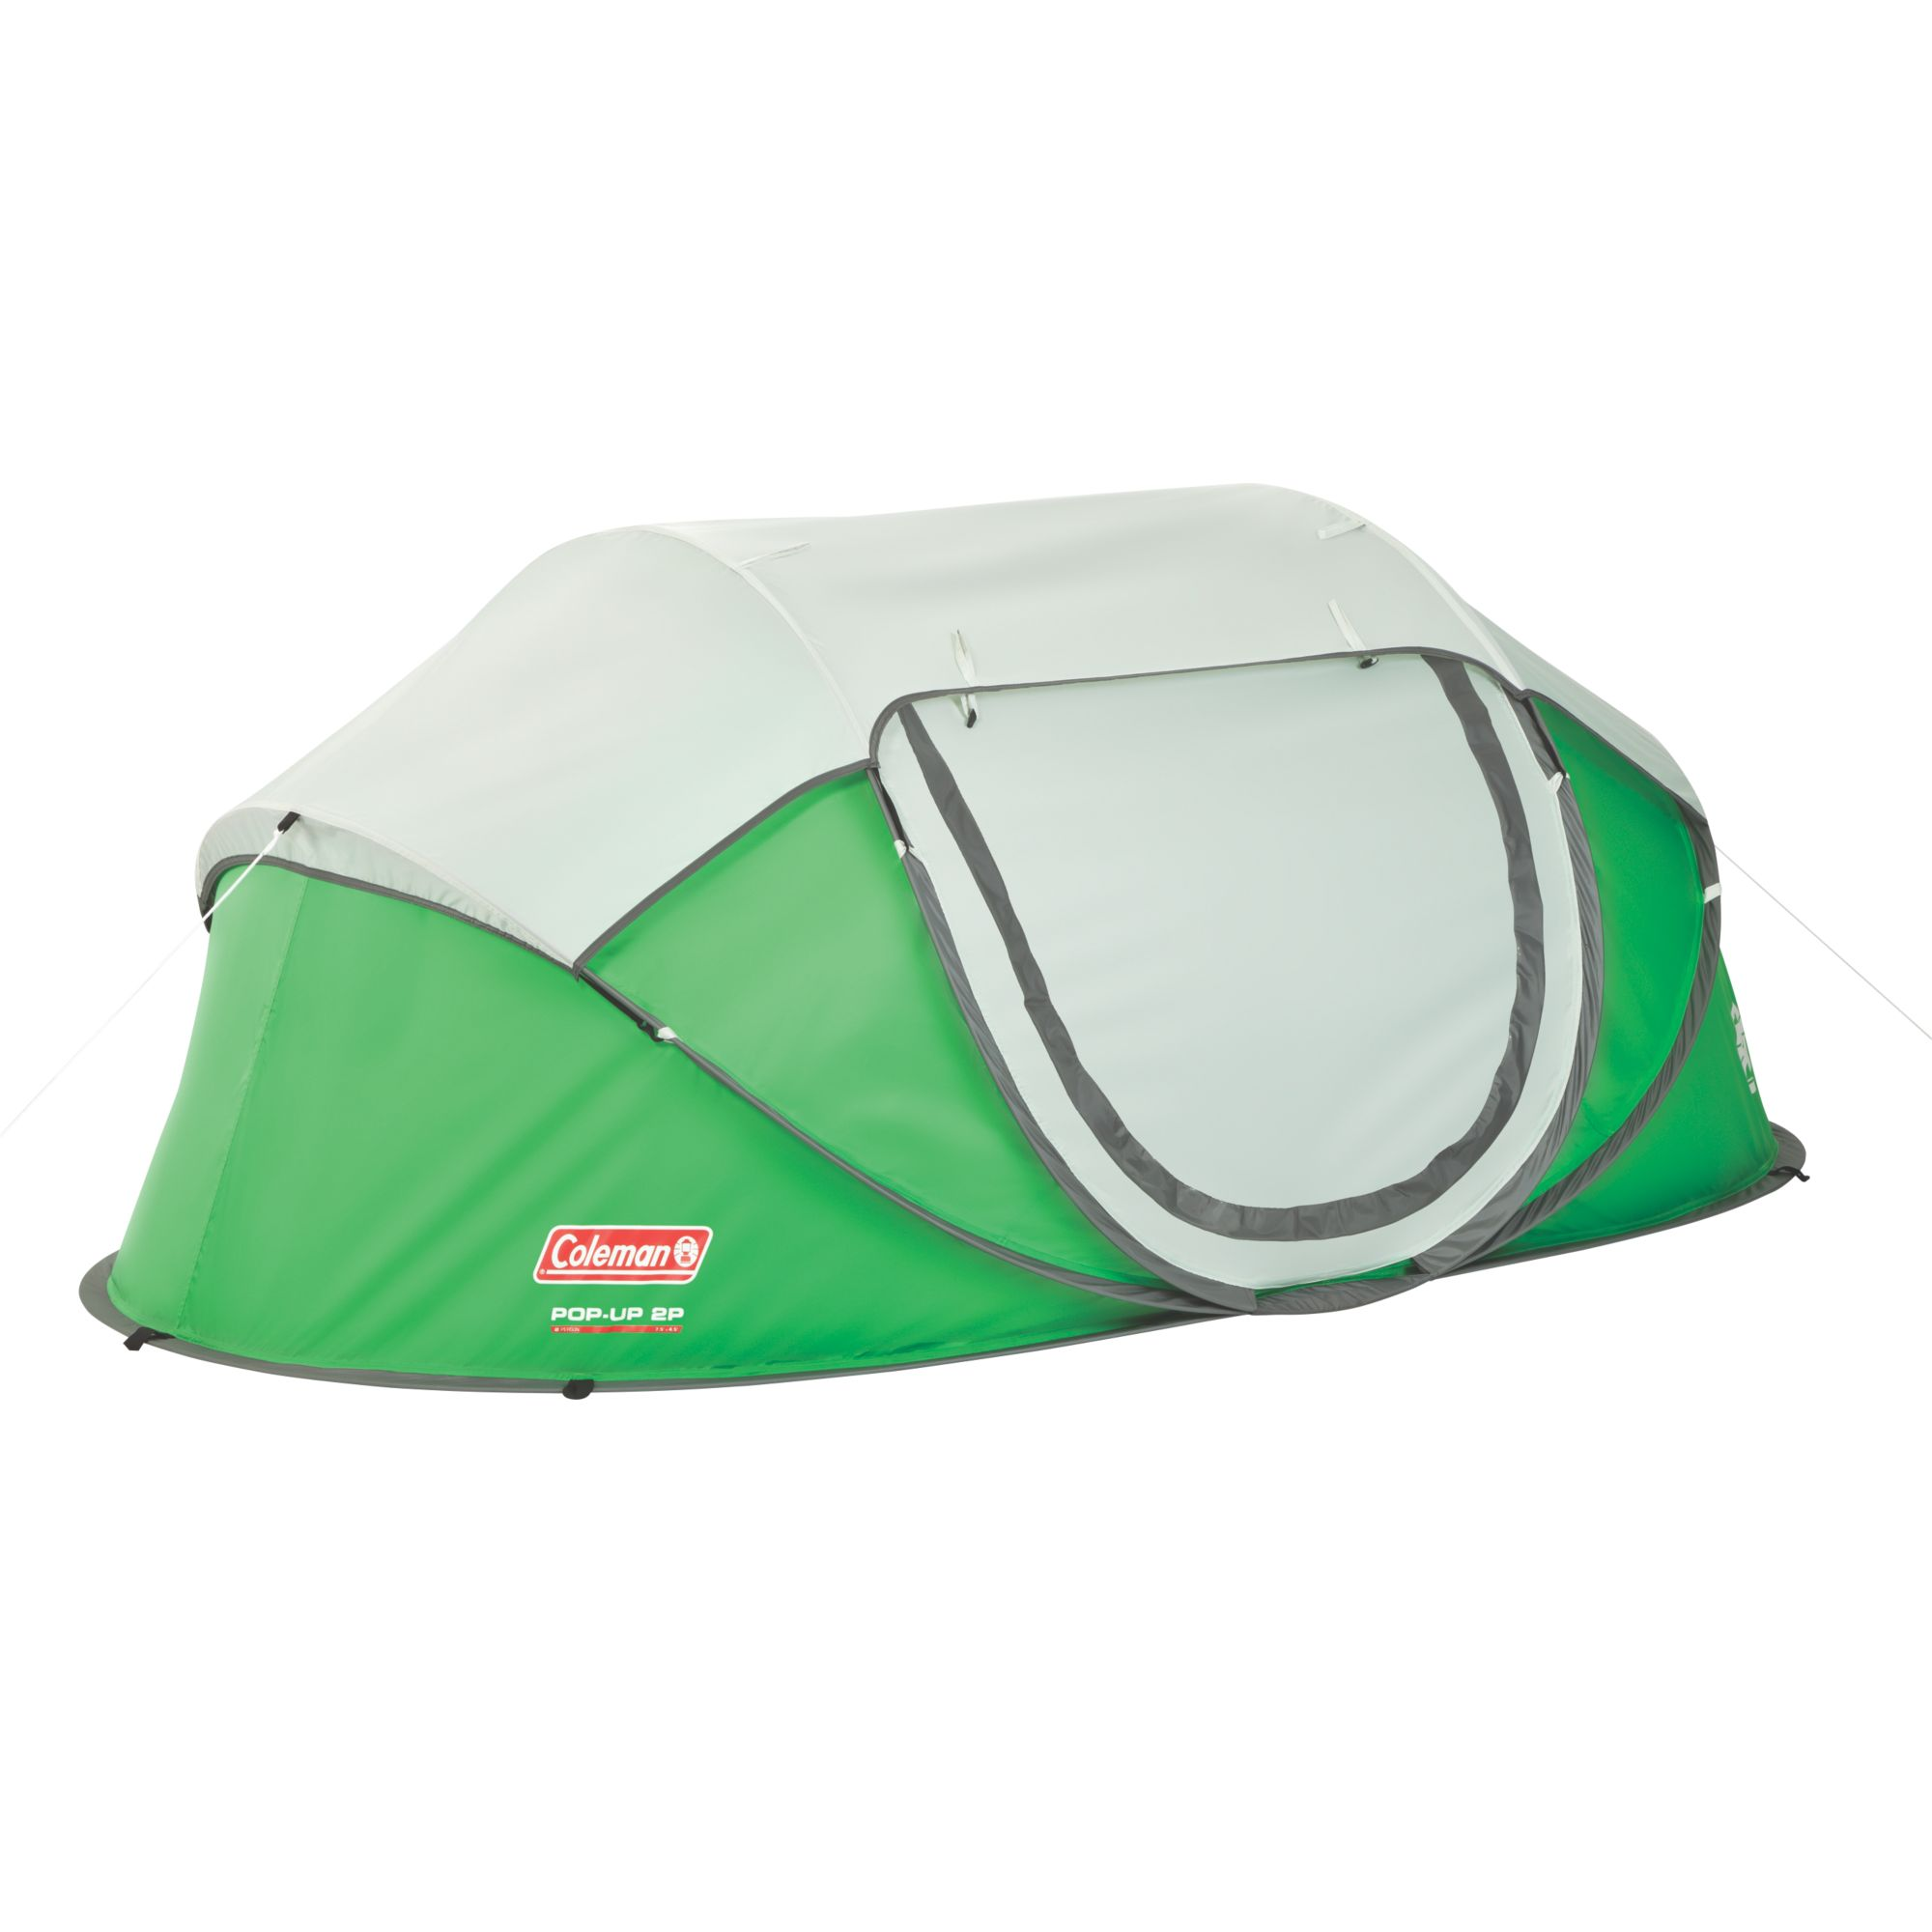 bd49b4337b5 ... 4 · 2-Person Pop-Up Tent image 1 ...